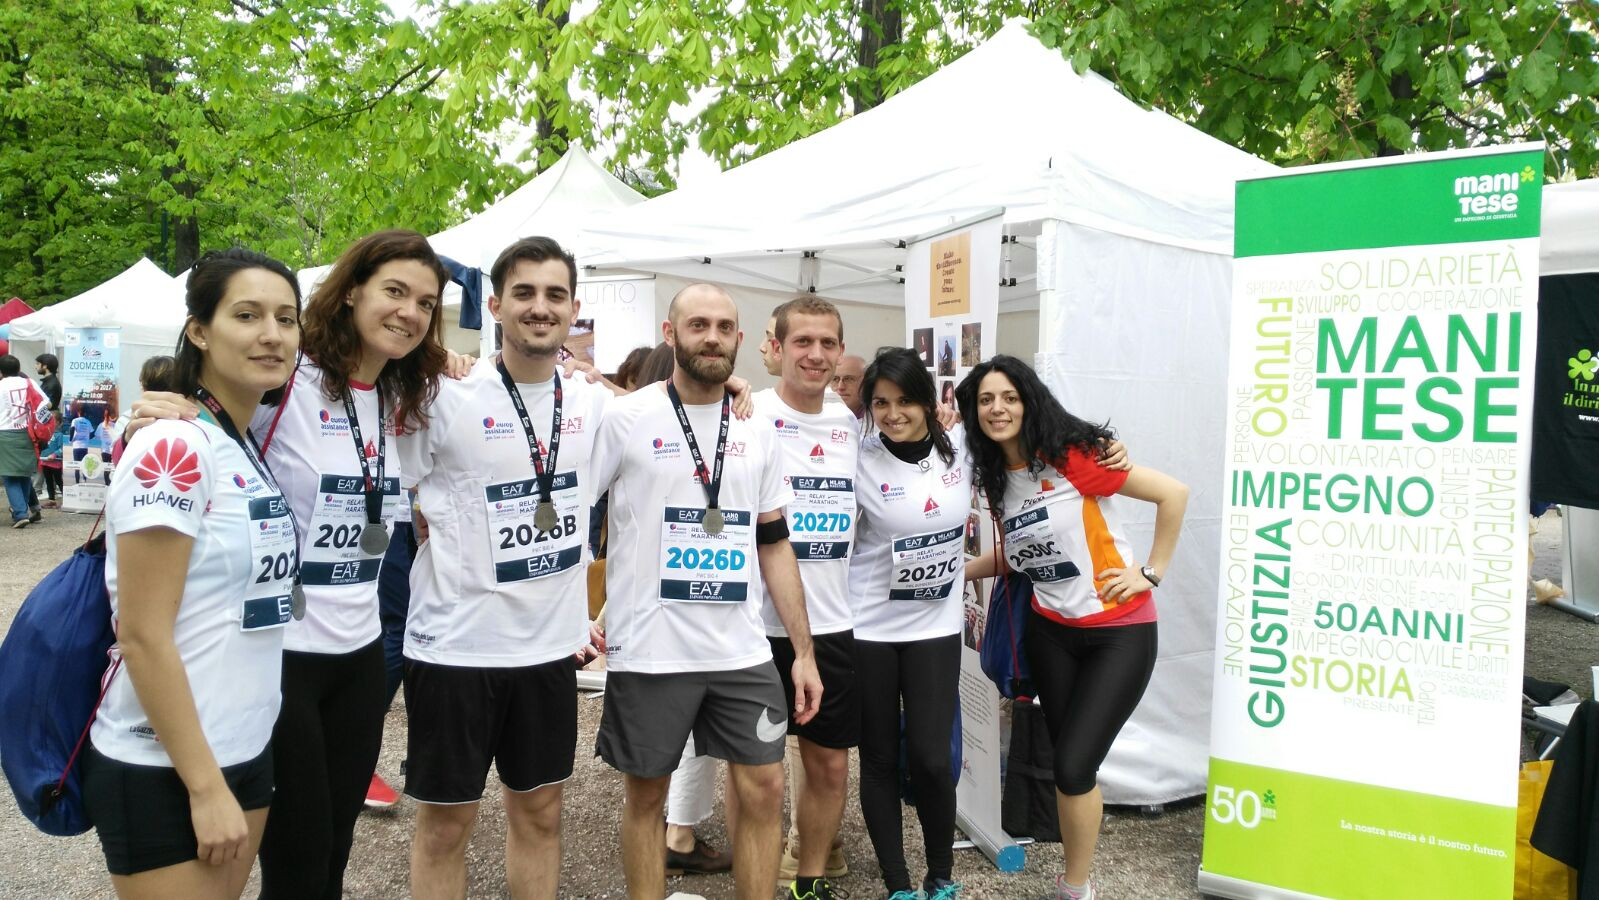 Milano_Marathon_Mani_Tese_2017